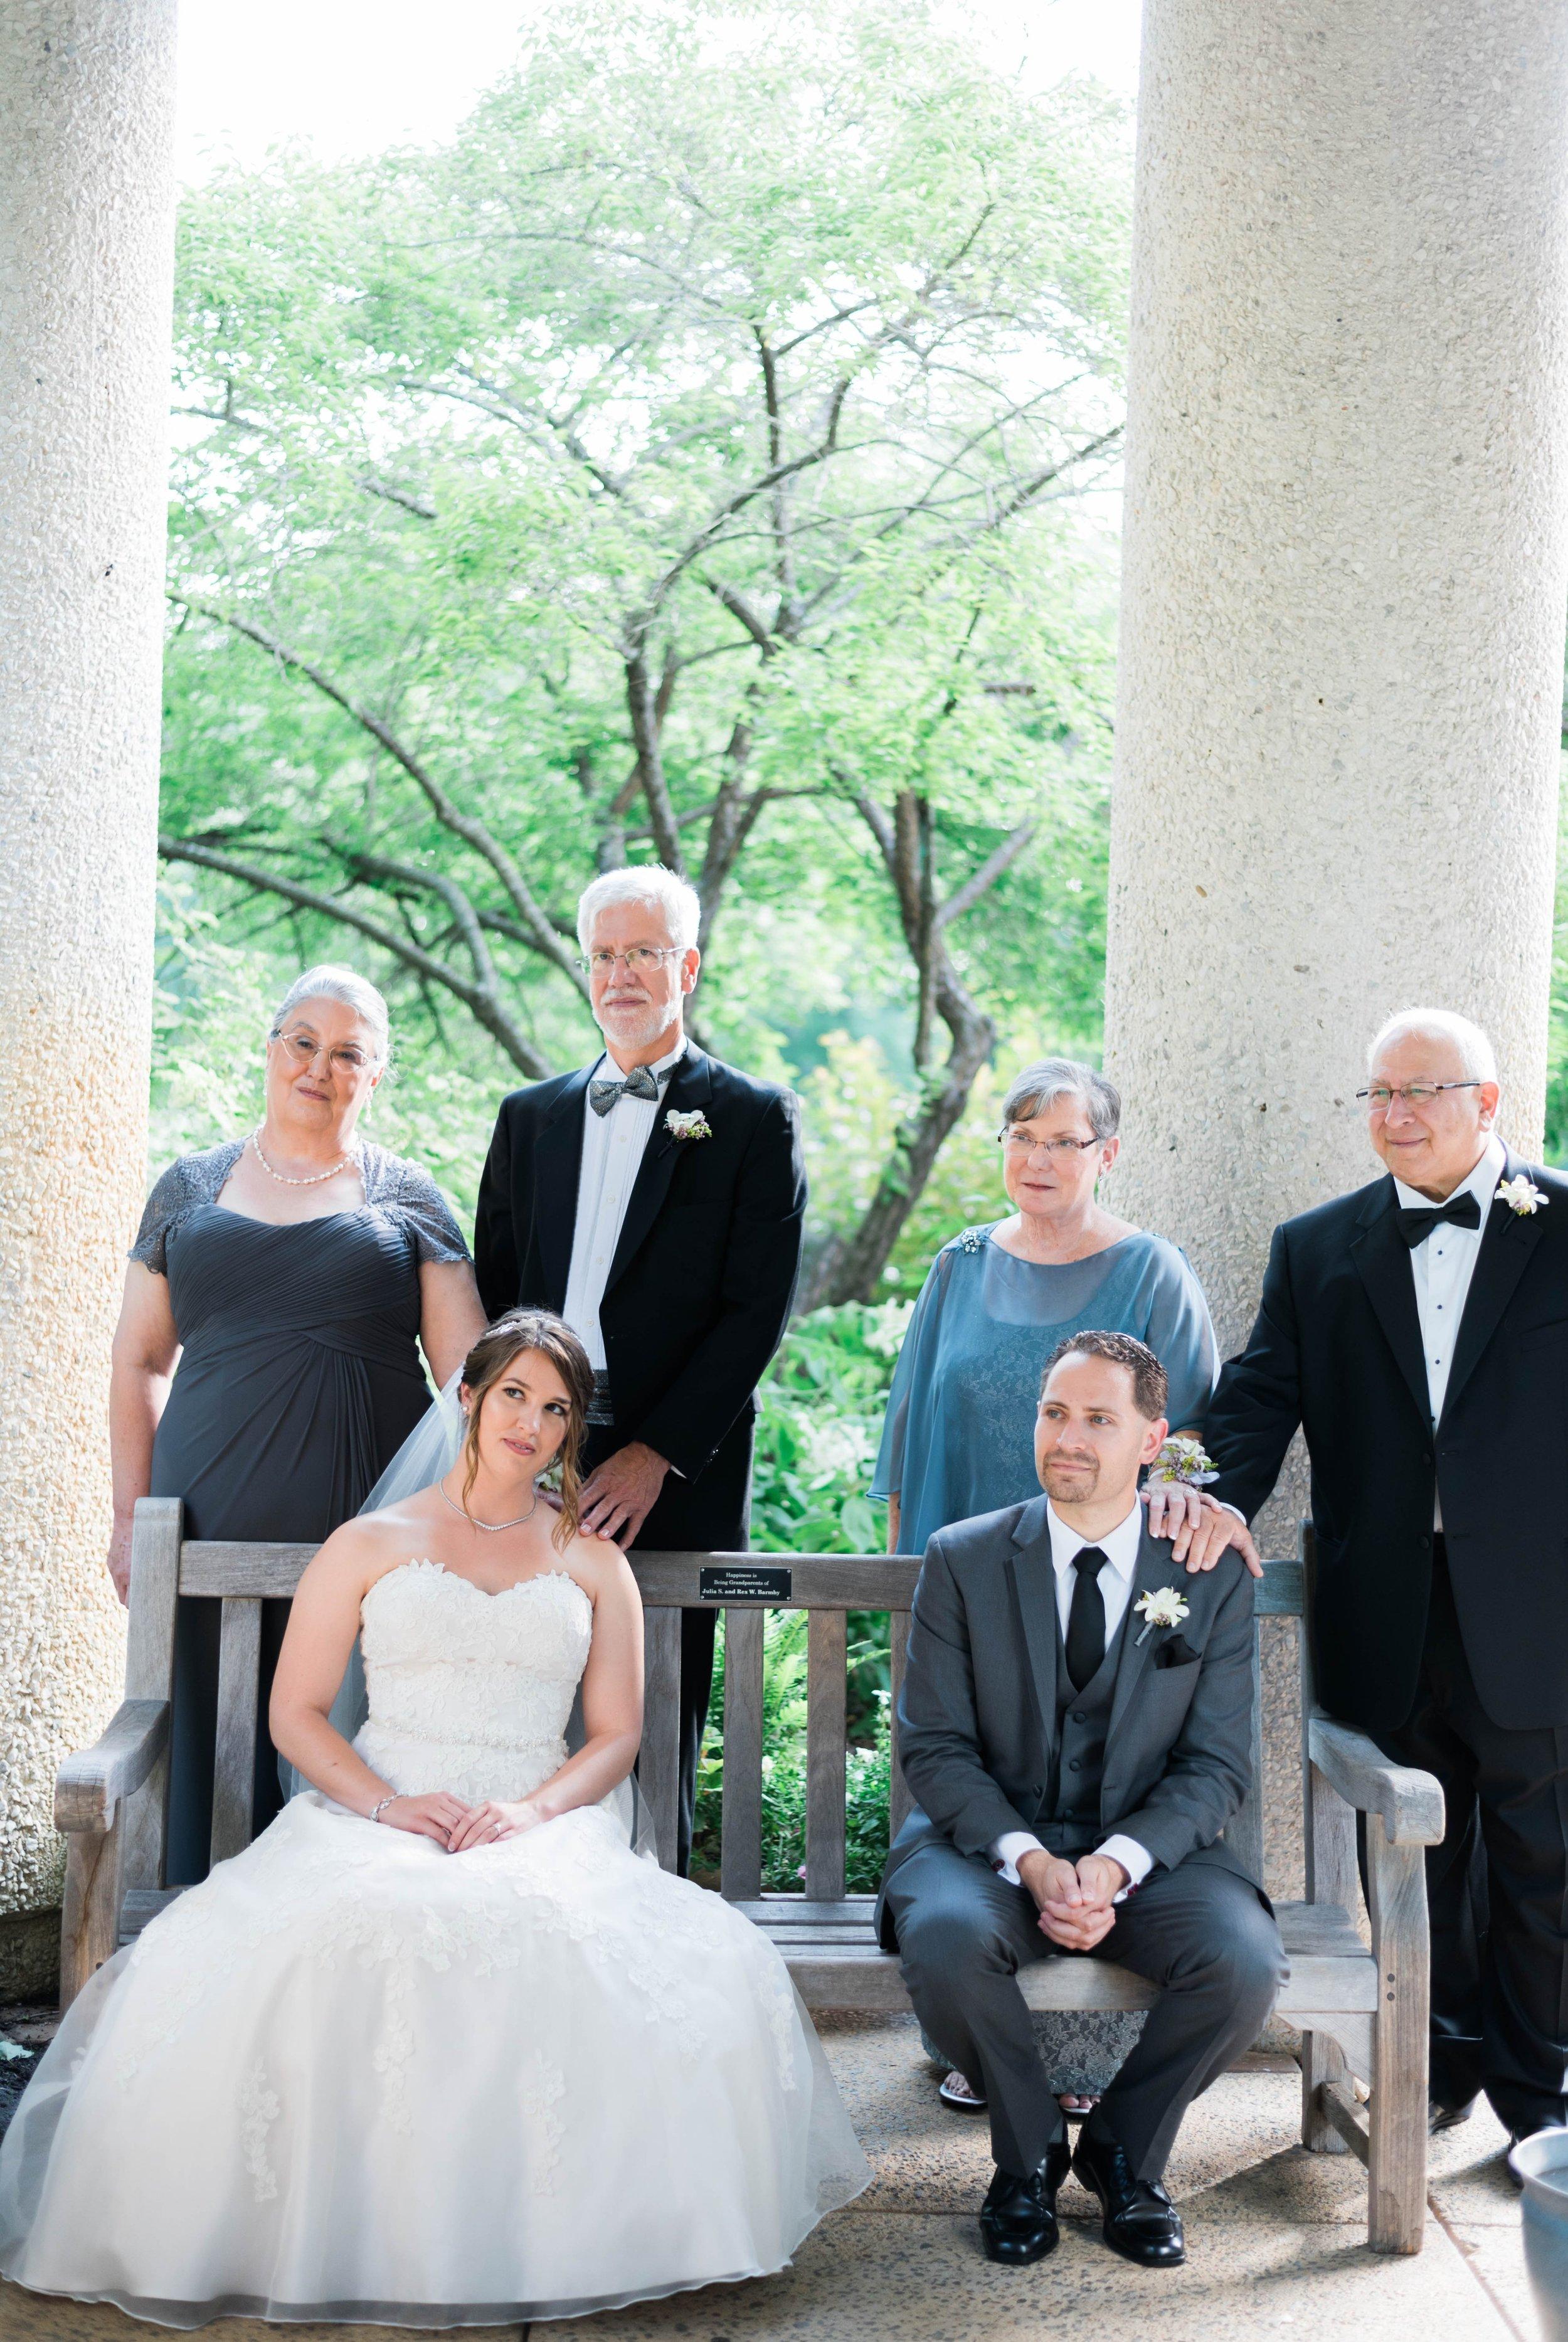 TheAtriumatMeadowlark_Virginiawedding photographer_lynchburgweddingphotographer_DCweddingPhotographer_KristinAaron 14.jpg